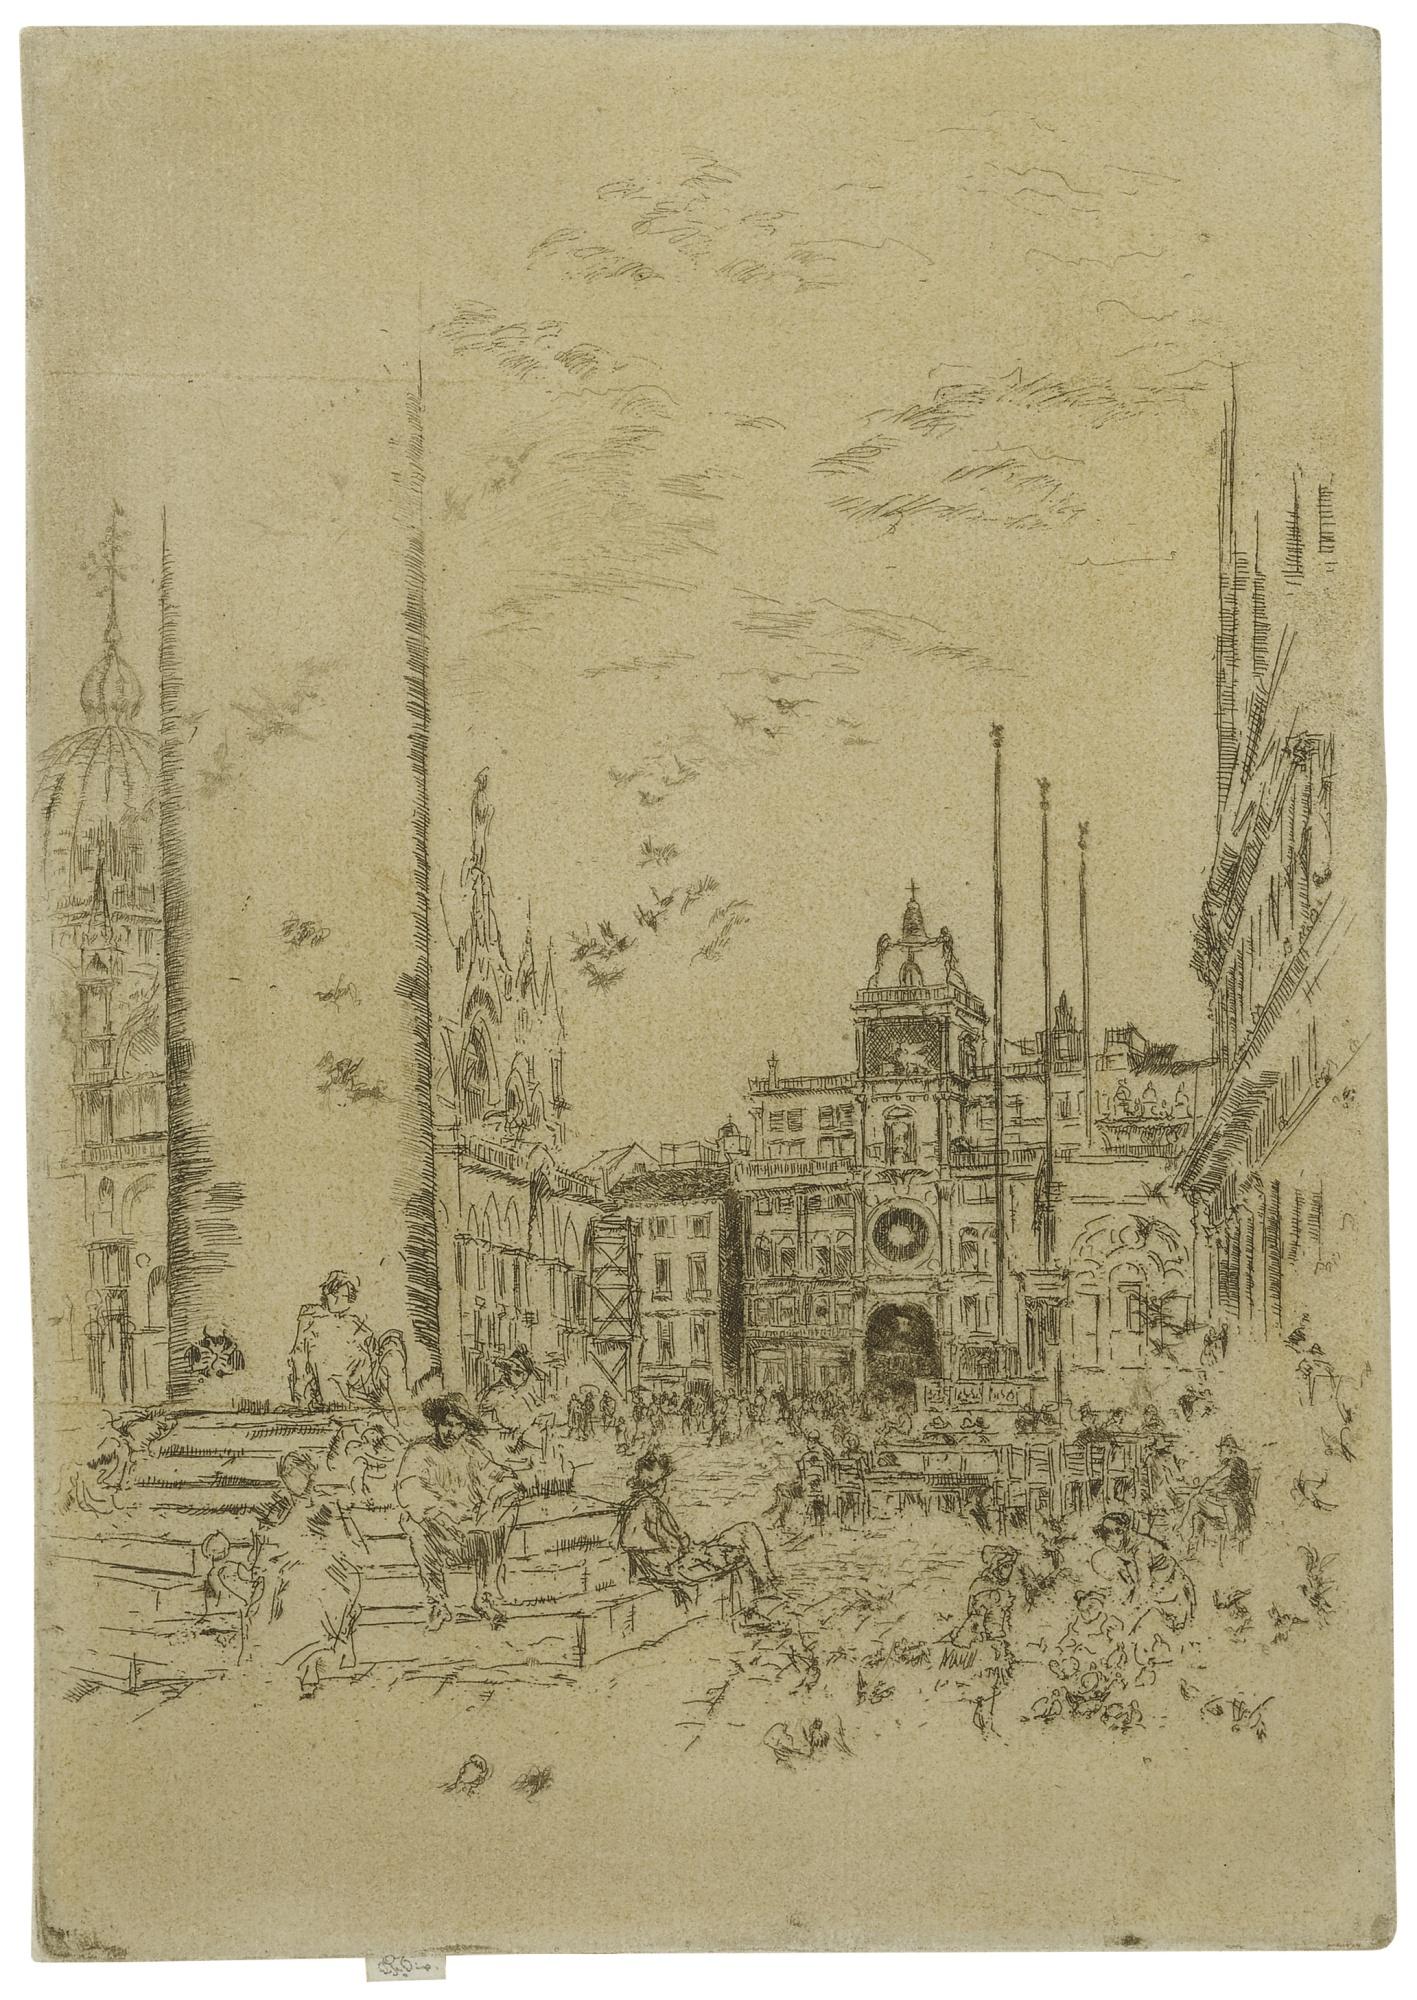 James Mcneill Whistler - The Piazzetta (K. 189; G. 218)-1880